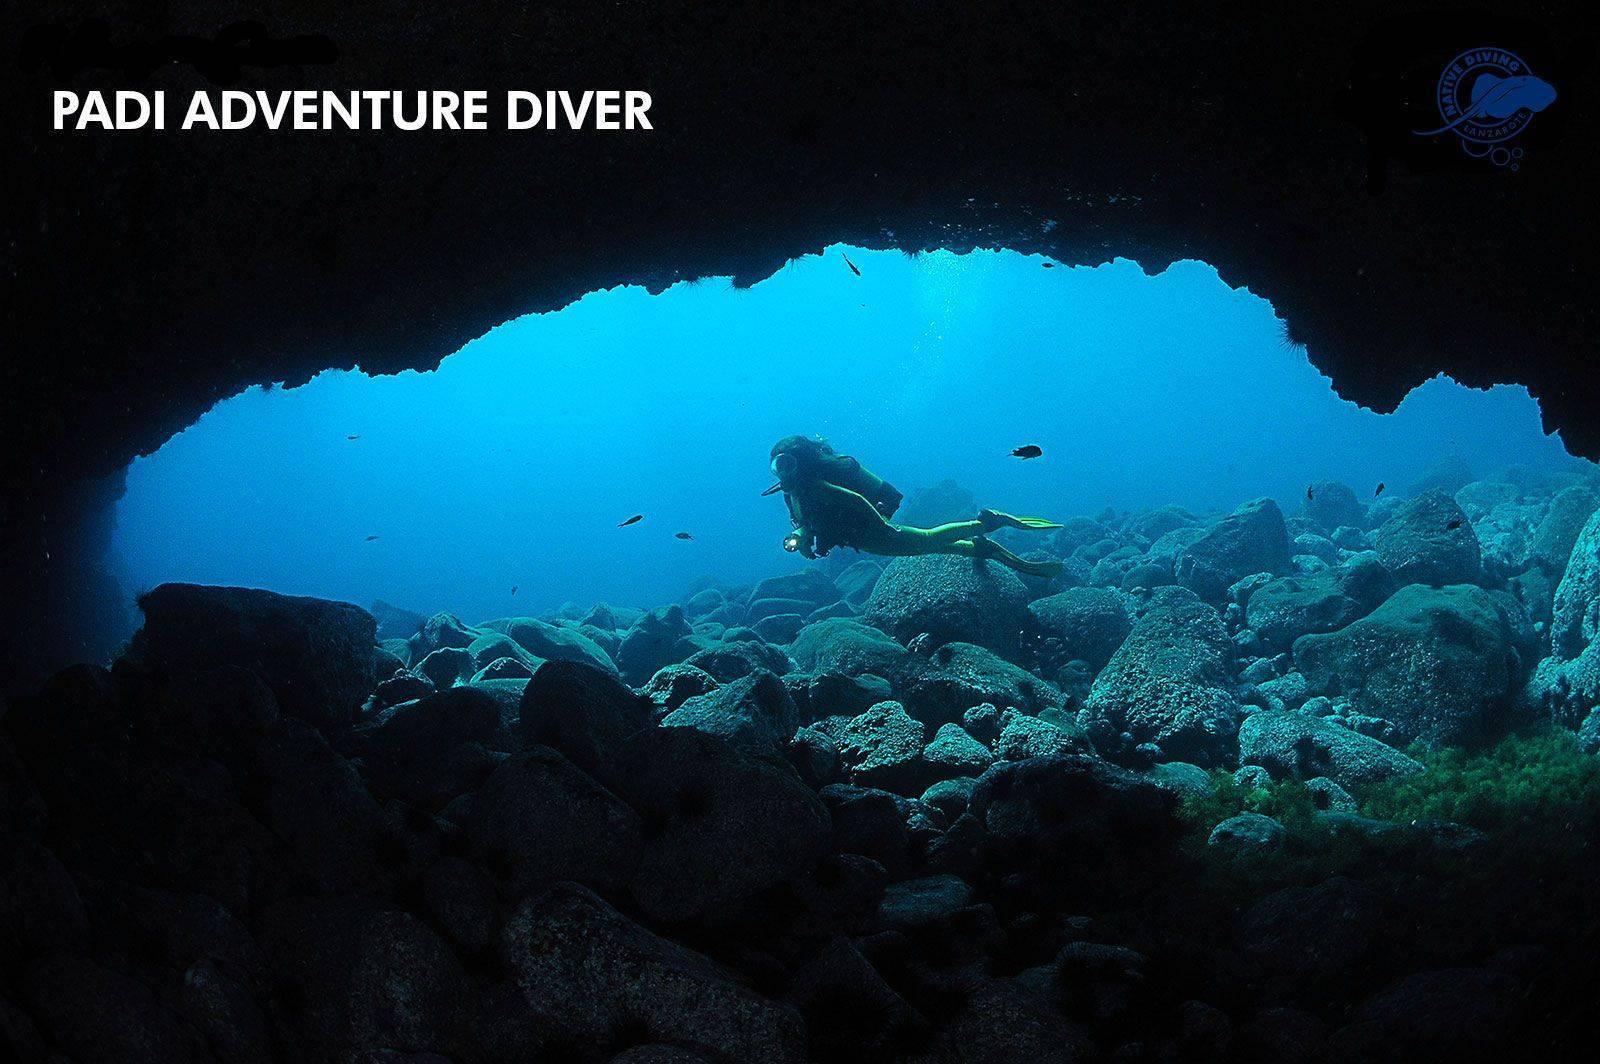 Adventure diver PADI